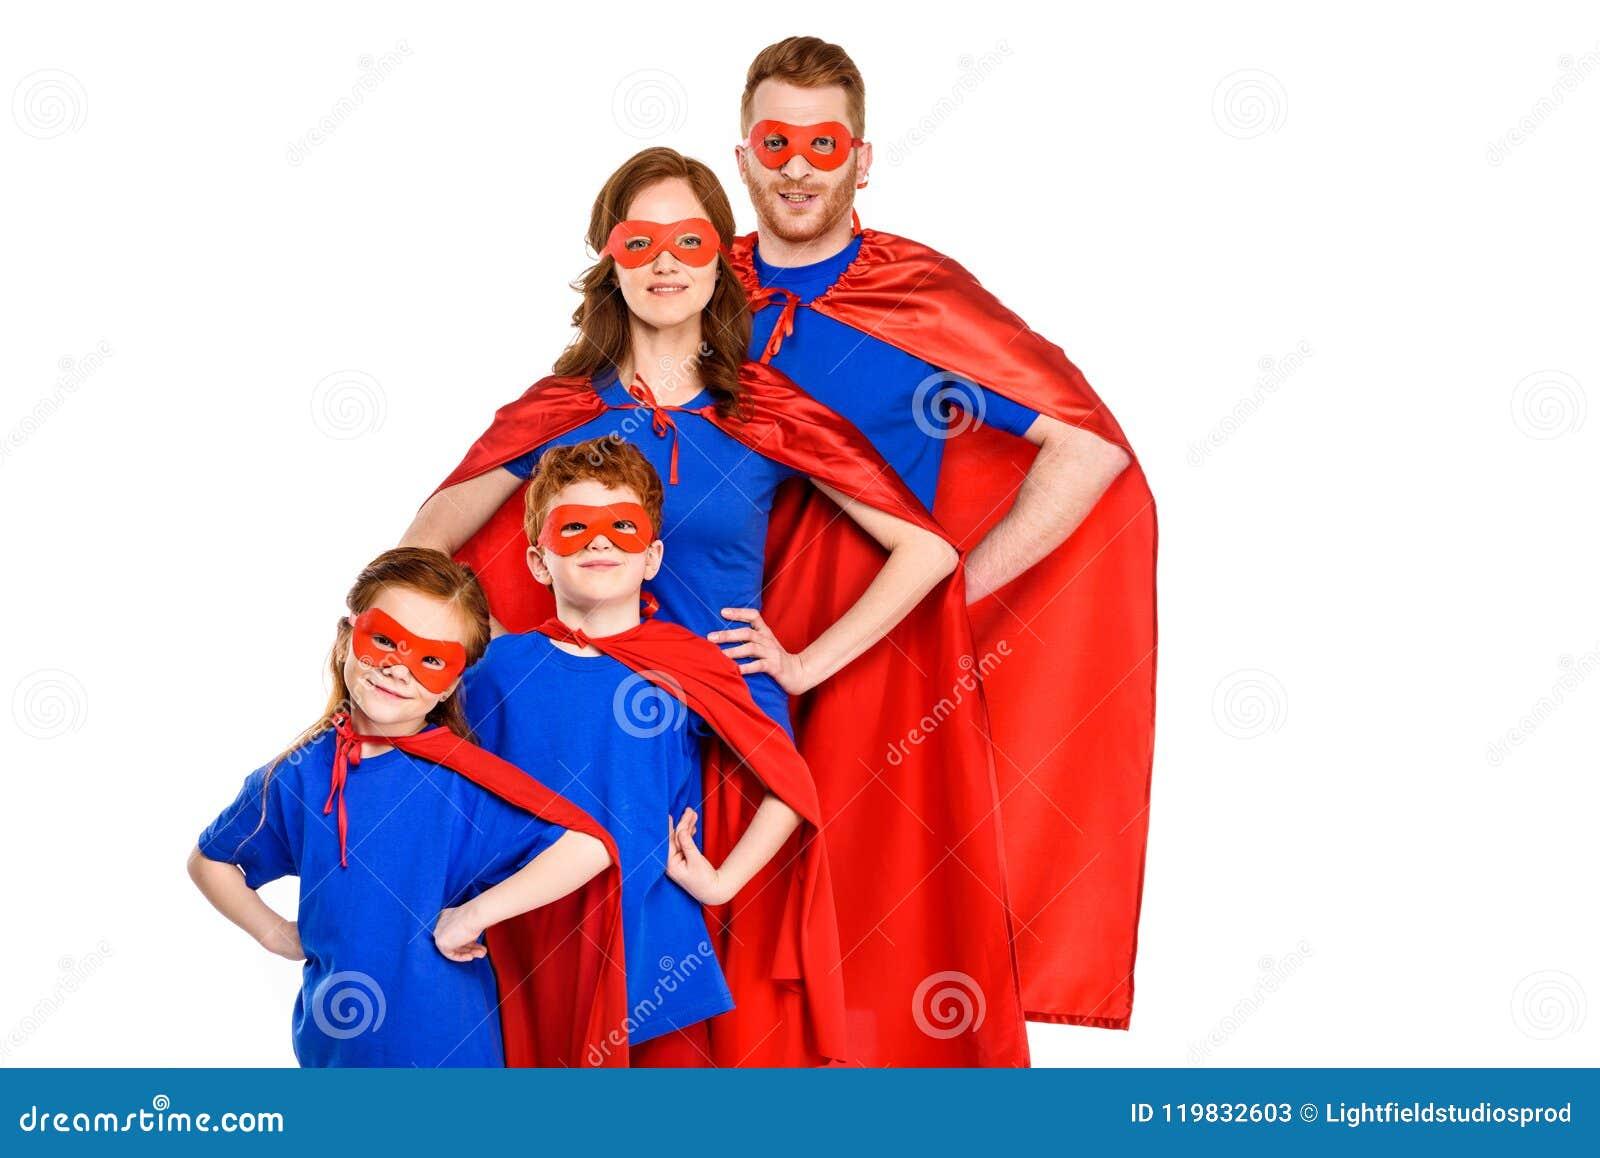 Ufna super rodzina w maskach, pelerynach i